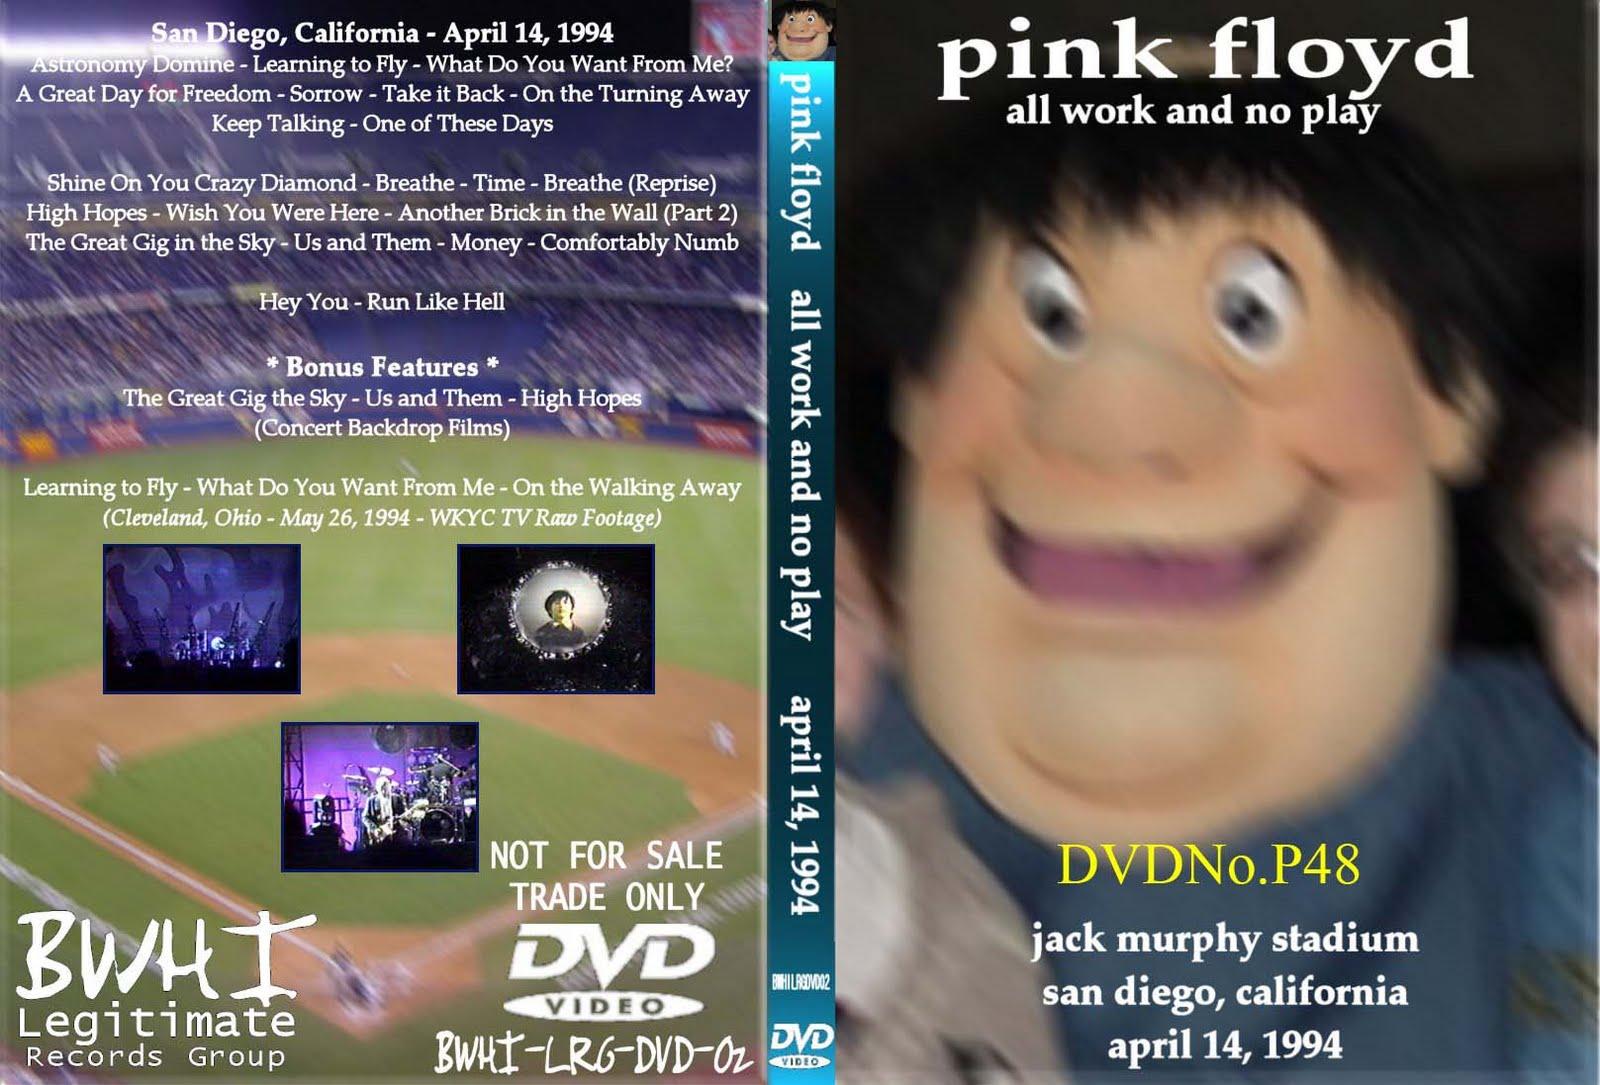 http://4.bp.blogspot.com/_j92JYU6EuQY/TFhzoFEhVfI/AAAAAAAABZk/o2vg4Zq2-1I/s1600/P48+-+Pink+Floyd+-+015+-+1994-04-14+%E2%80%93+All+Work+And+No+Play_dvd+concert_dvd+bootleg_%E0%B8%94%E0%B8%B5%E0%B8%A7%E0%B8%B5%E0%B8%94%E0%B8%B5%E0%B8%84%E0%B8%AD%E0%B8%99%E0%B9%80%E0%B8%AA%E0%B8%B4%E0%B8%A3%E0%B9%8C%E0%B8%8B.jpg.jpg